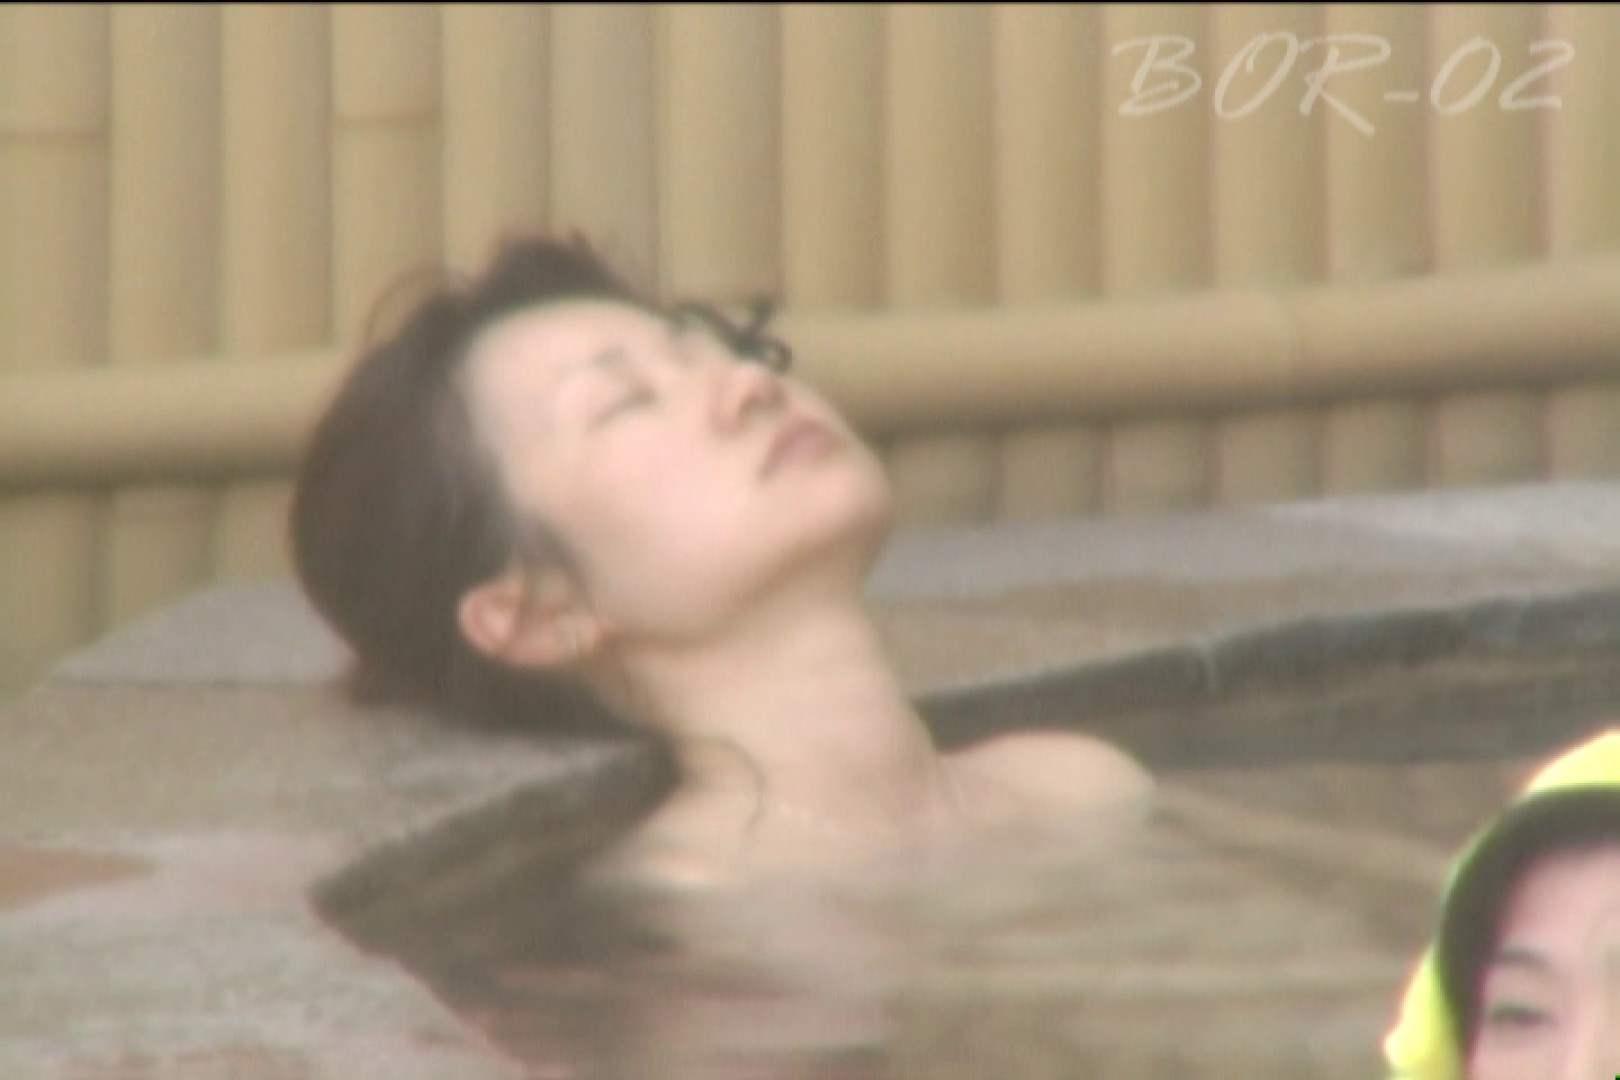 Aquaな露天風呂Vol.477 盗撮シリーズ | 露天風呂編  104PIX 29